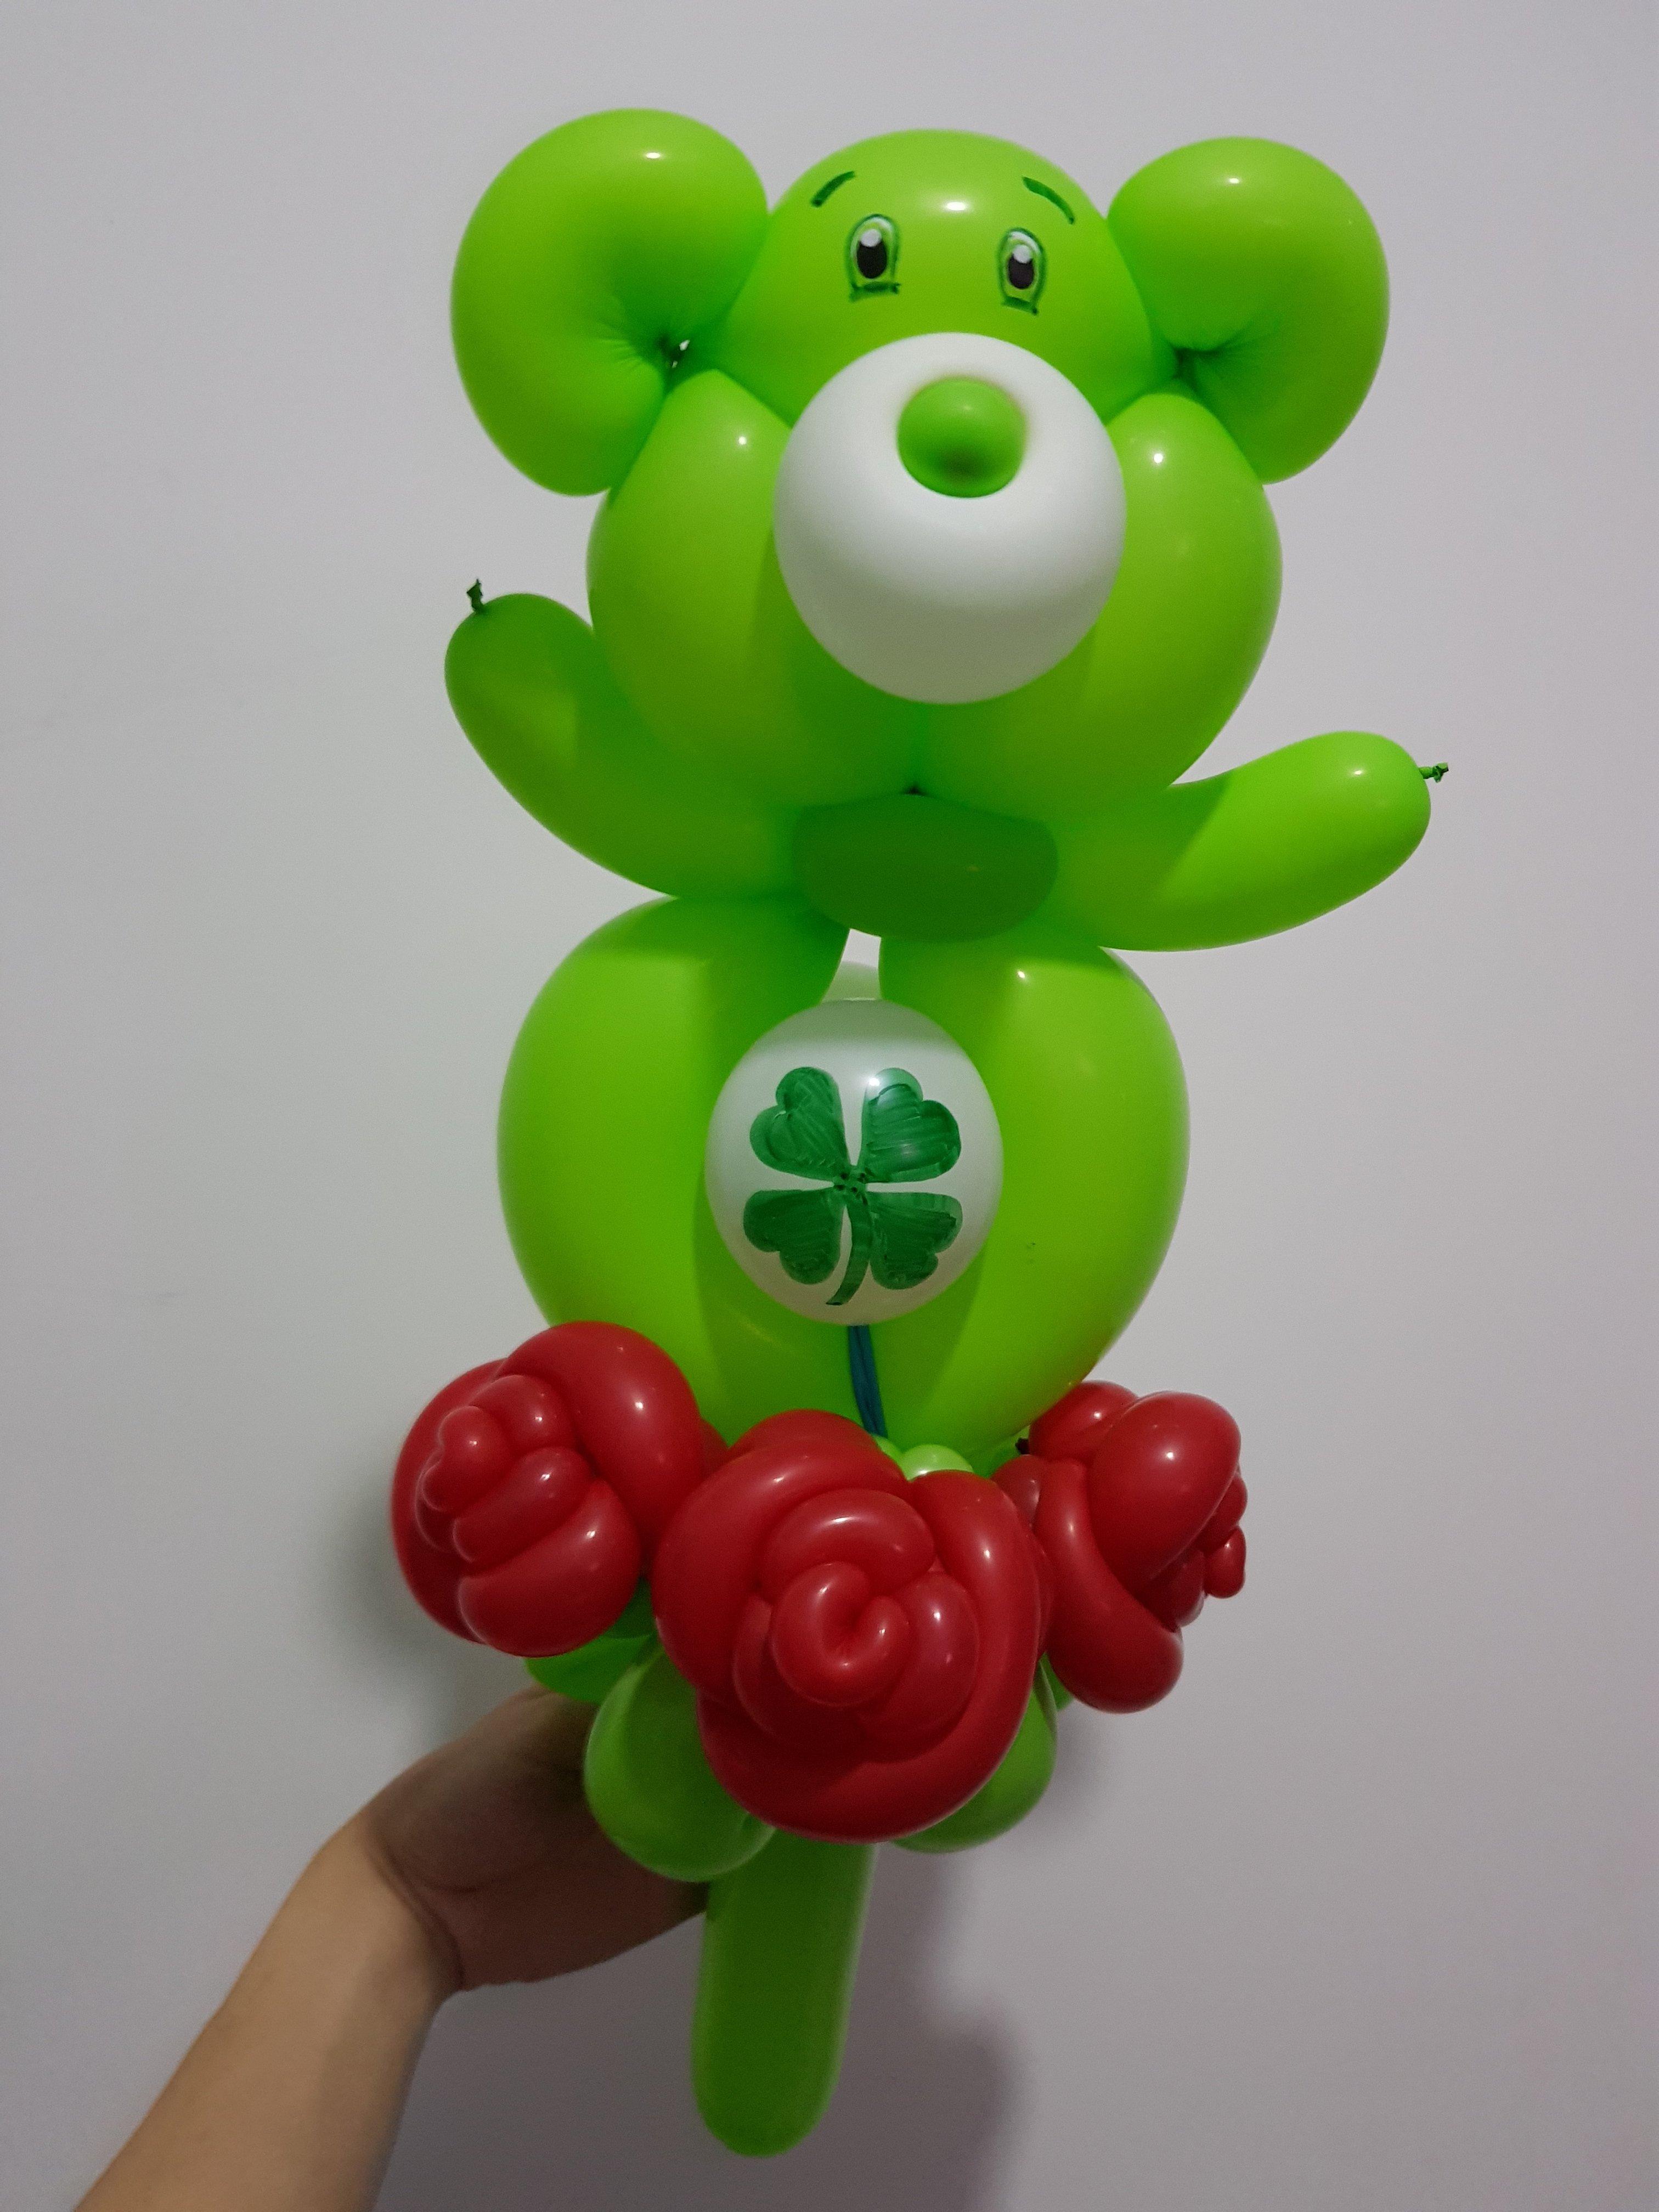 , Care Bear balloon sculptures, Singapore Balloon Decoration Services - Balloon Workshop and Balloon Sculpting